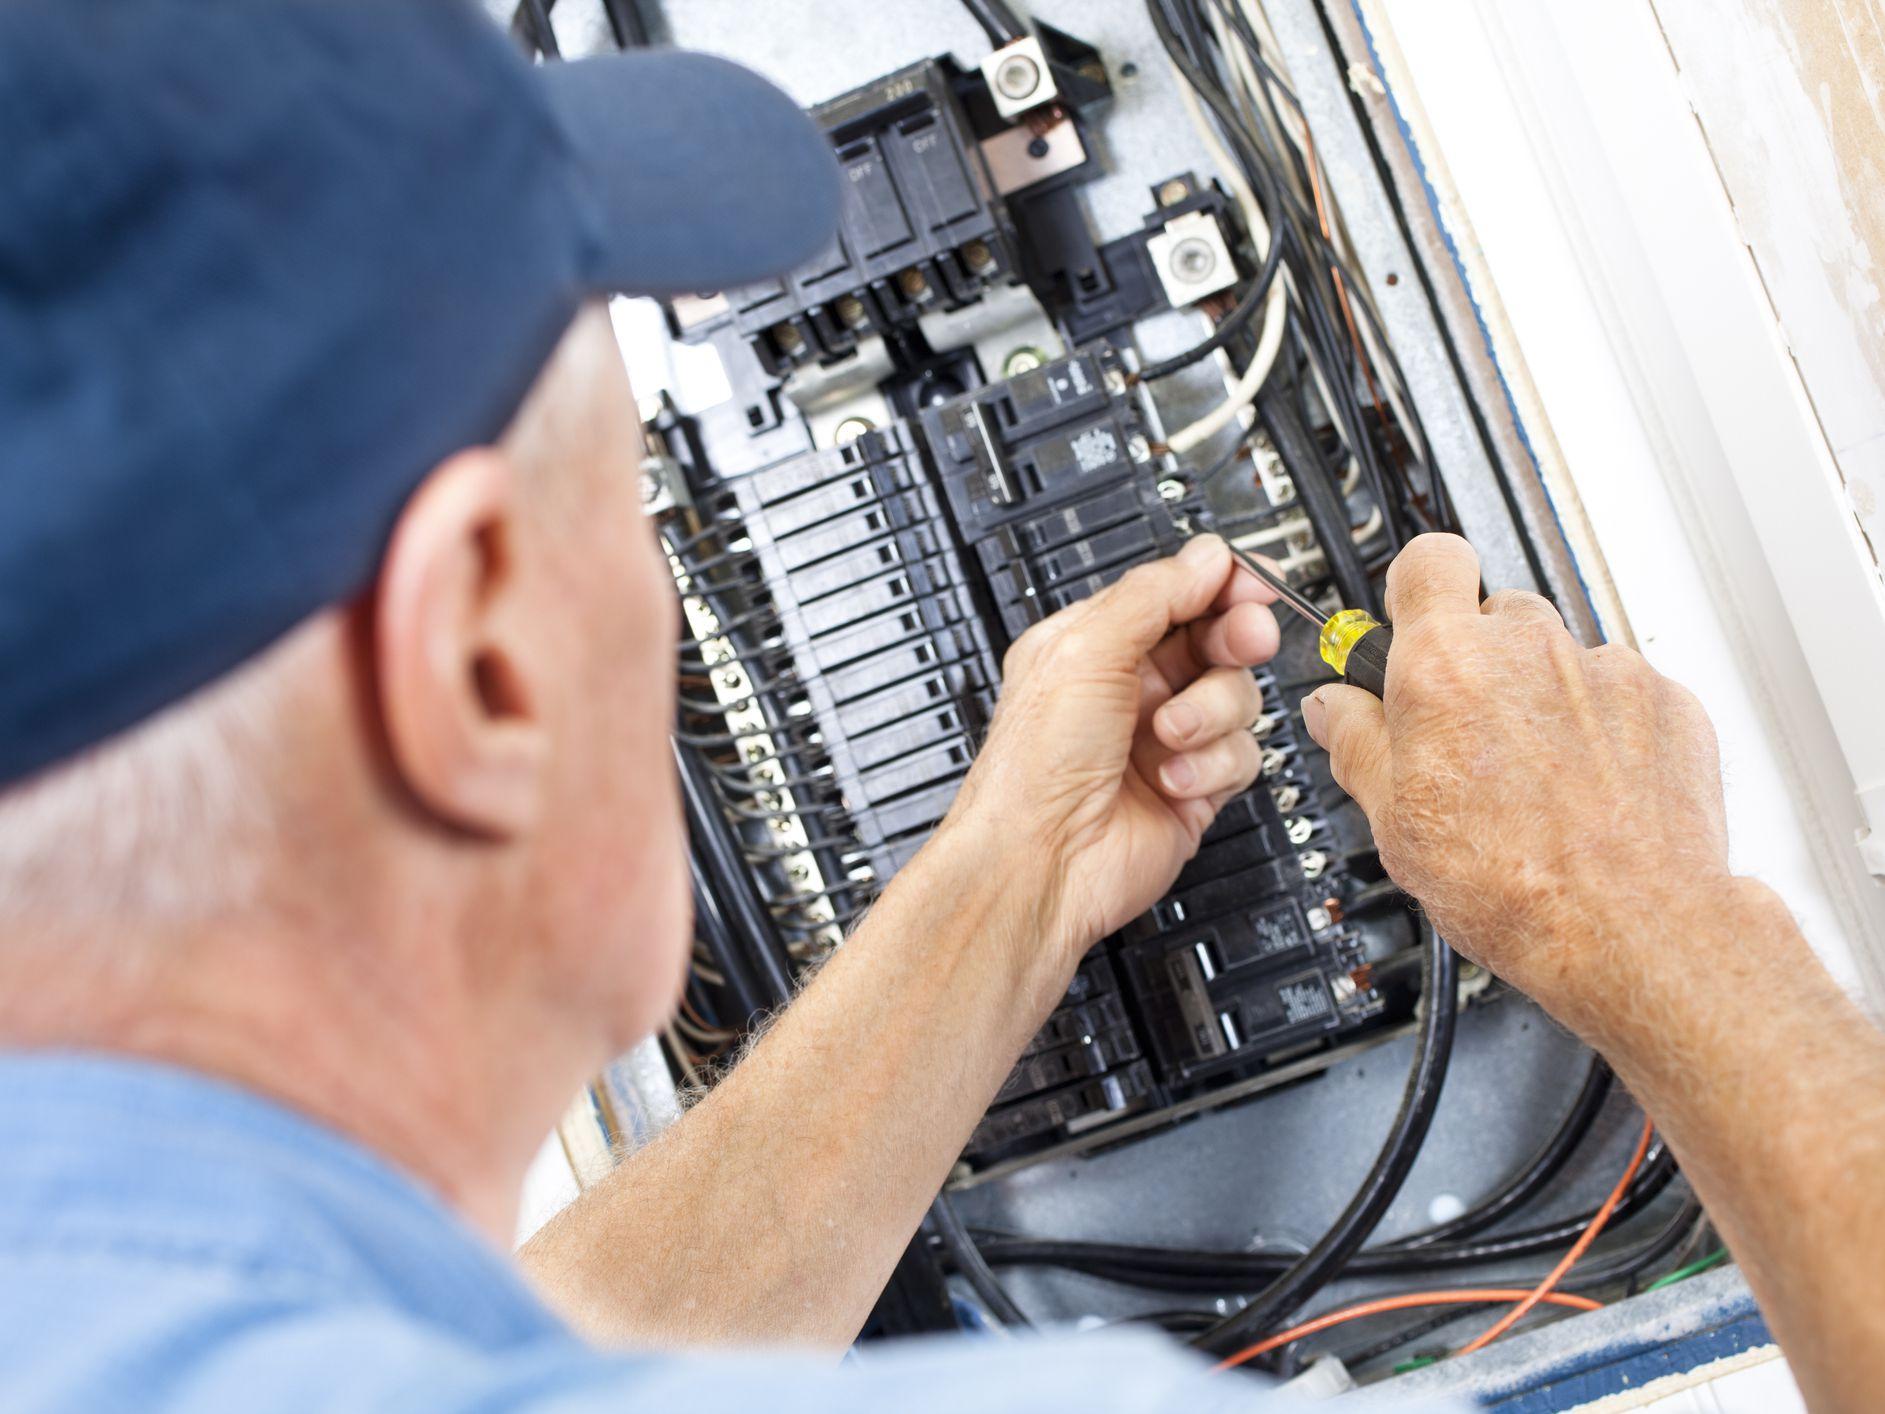 hight resolution of 200 amp panel wiring diagram pull thru